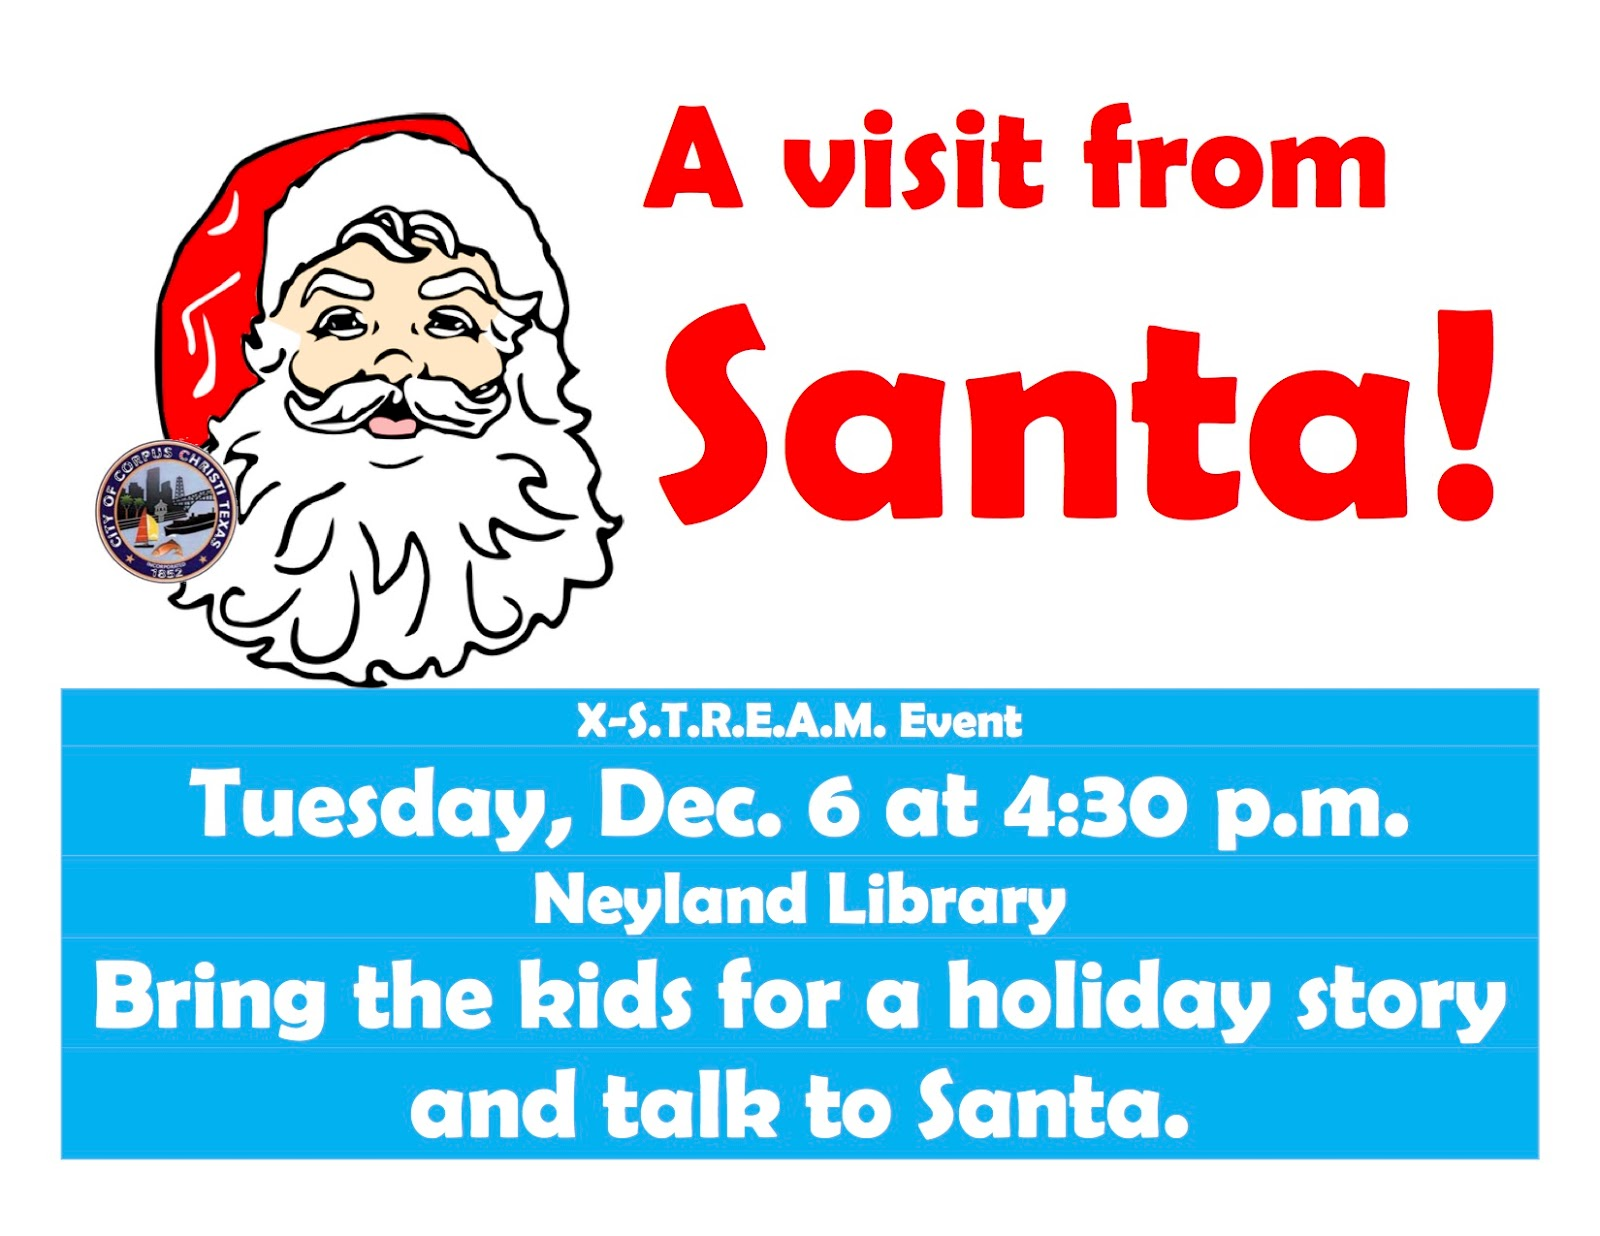 corpus christi fun for kids december holiday fun guide 2016